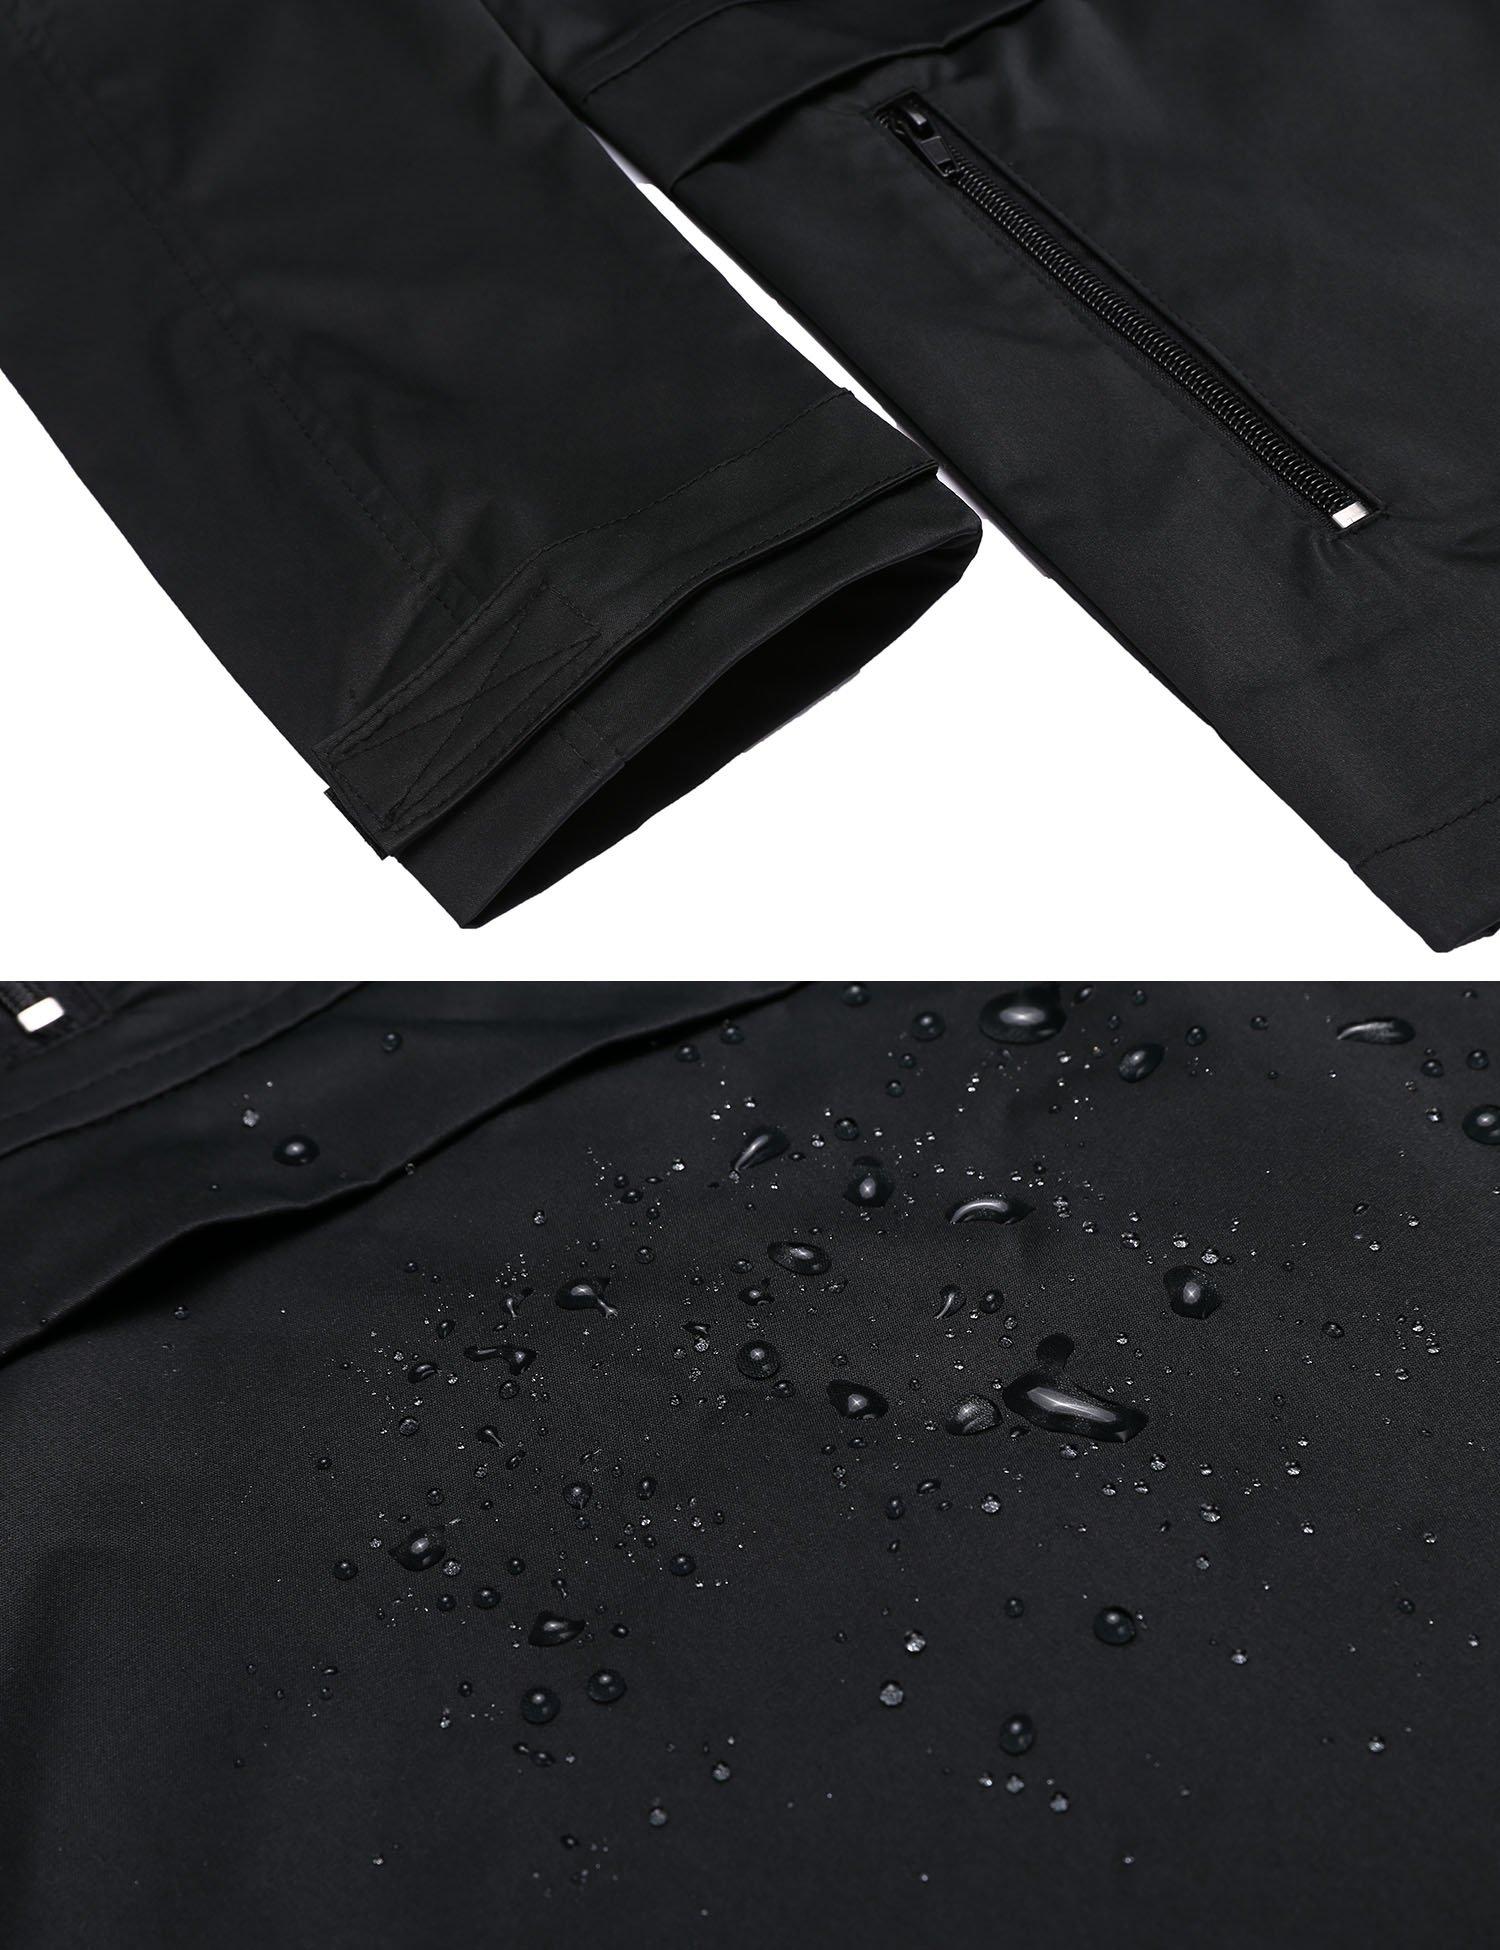 SummerRio Women's Waterproof Venture Resolve Softshell Rainwear Jacket (Black,Medium) by SummerRio (Image #5)